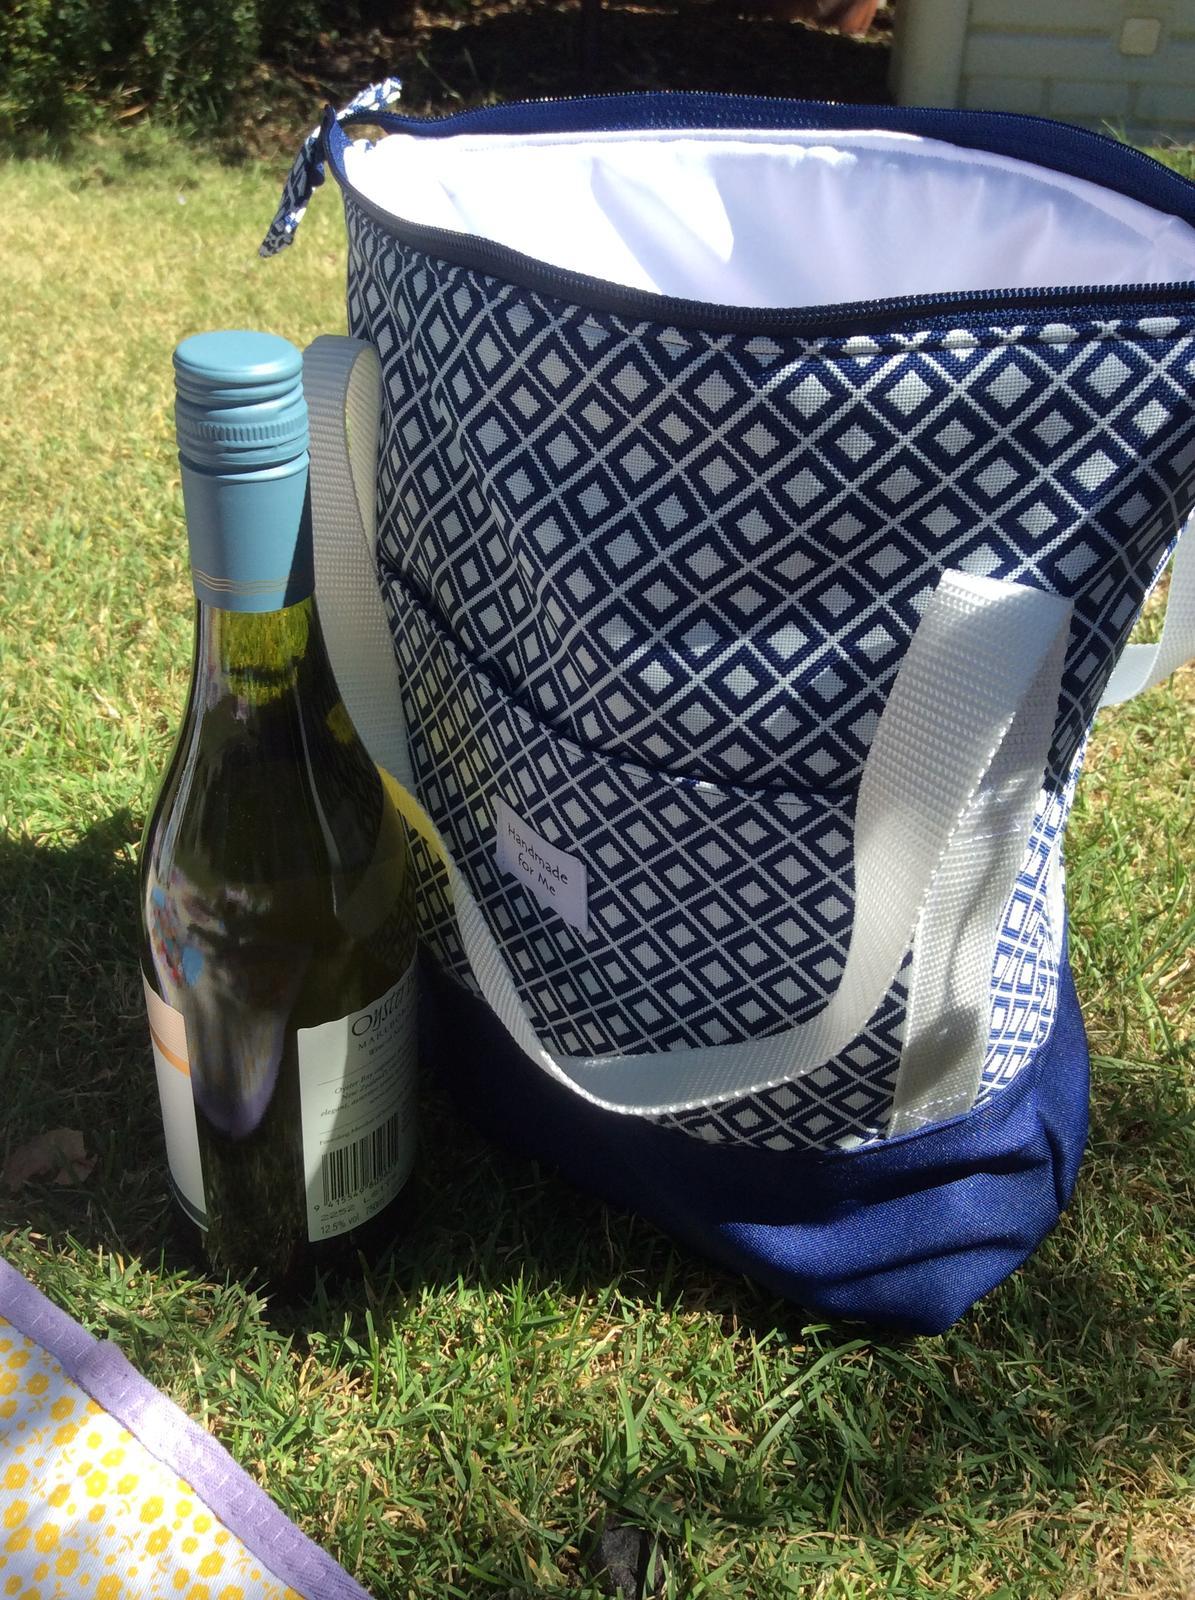 Blue Diamond Insulated Bag, Cooler Bag, Adult Lunch Bag, BPA Free